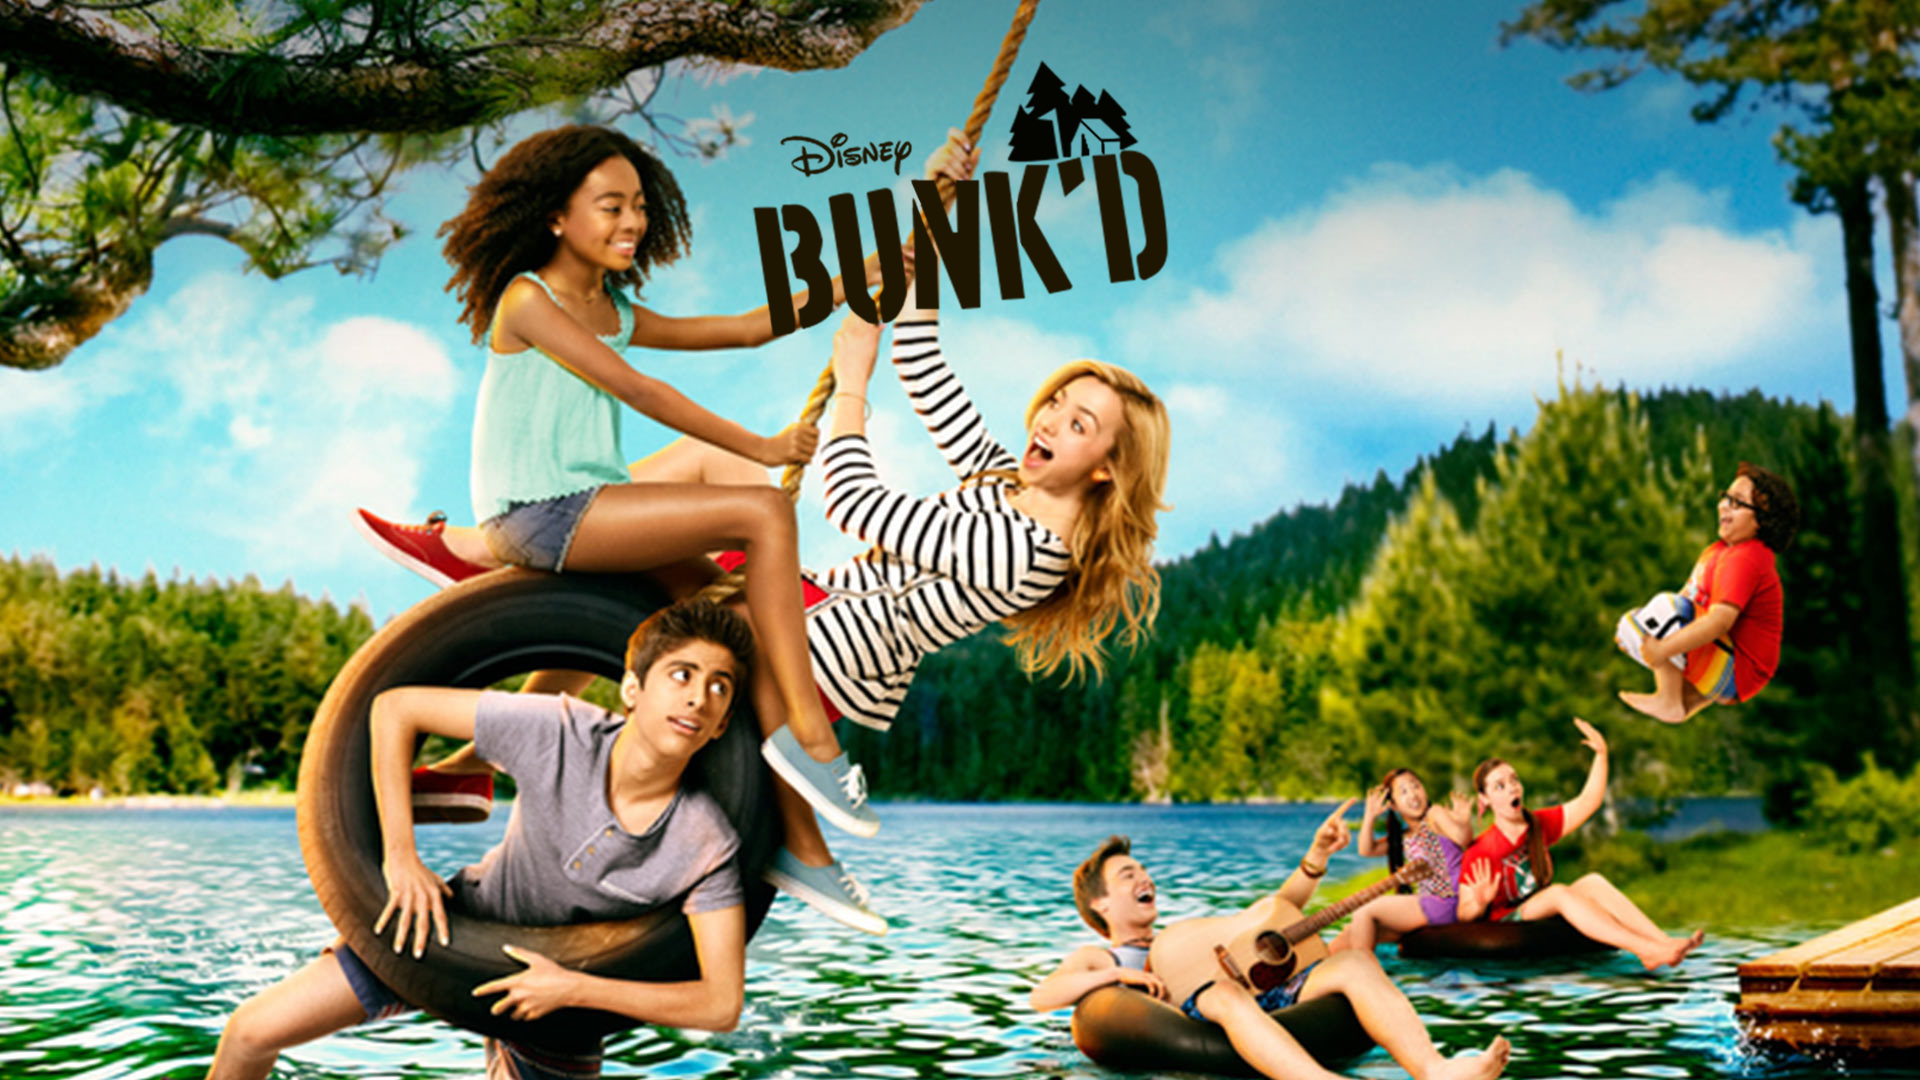 BUNK'D Volume 1